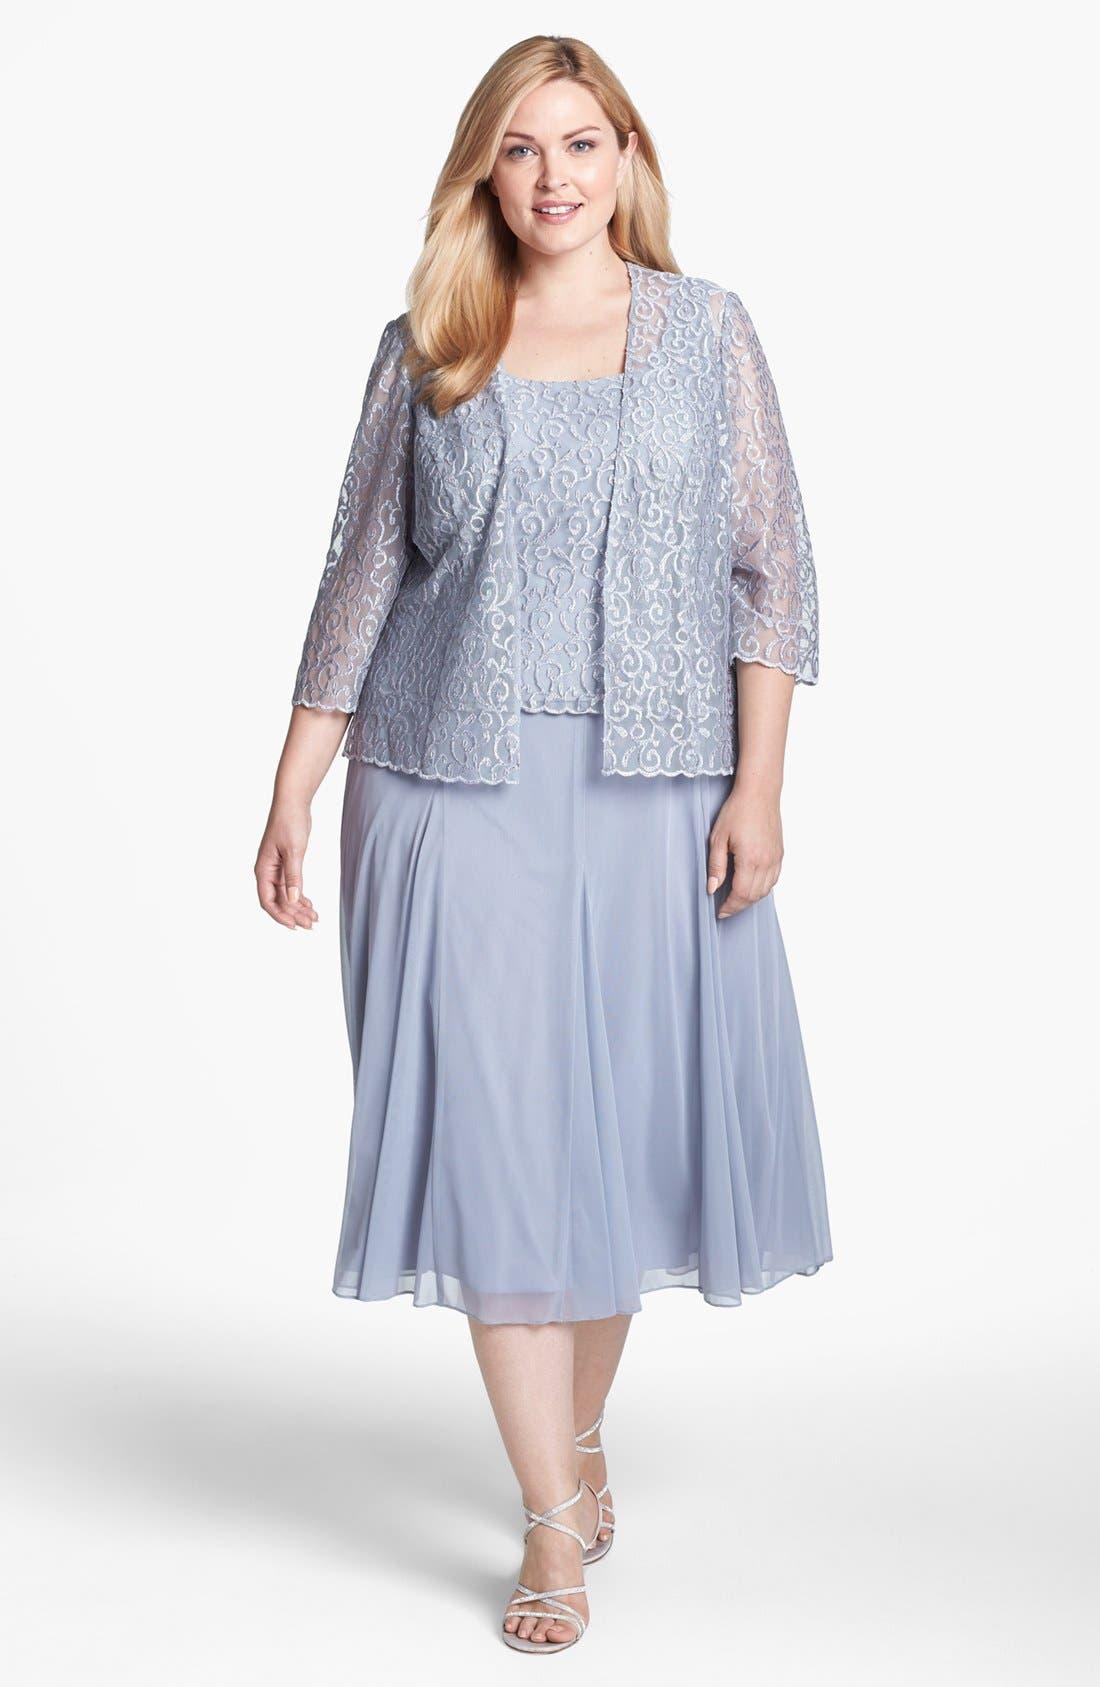 Main Image - Alex Evenings Mixed Media Dress & Jacket (Plus Size)